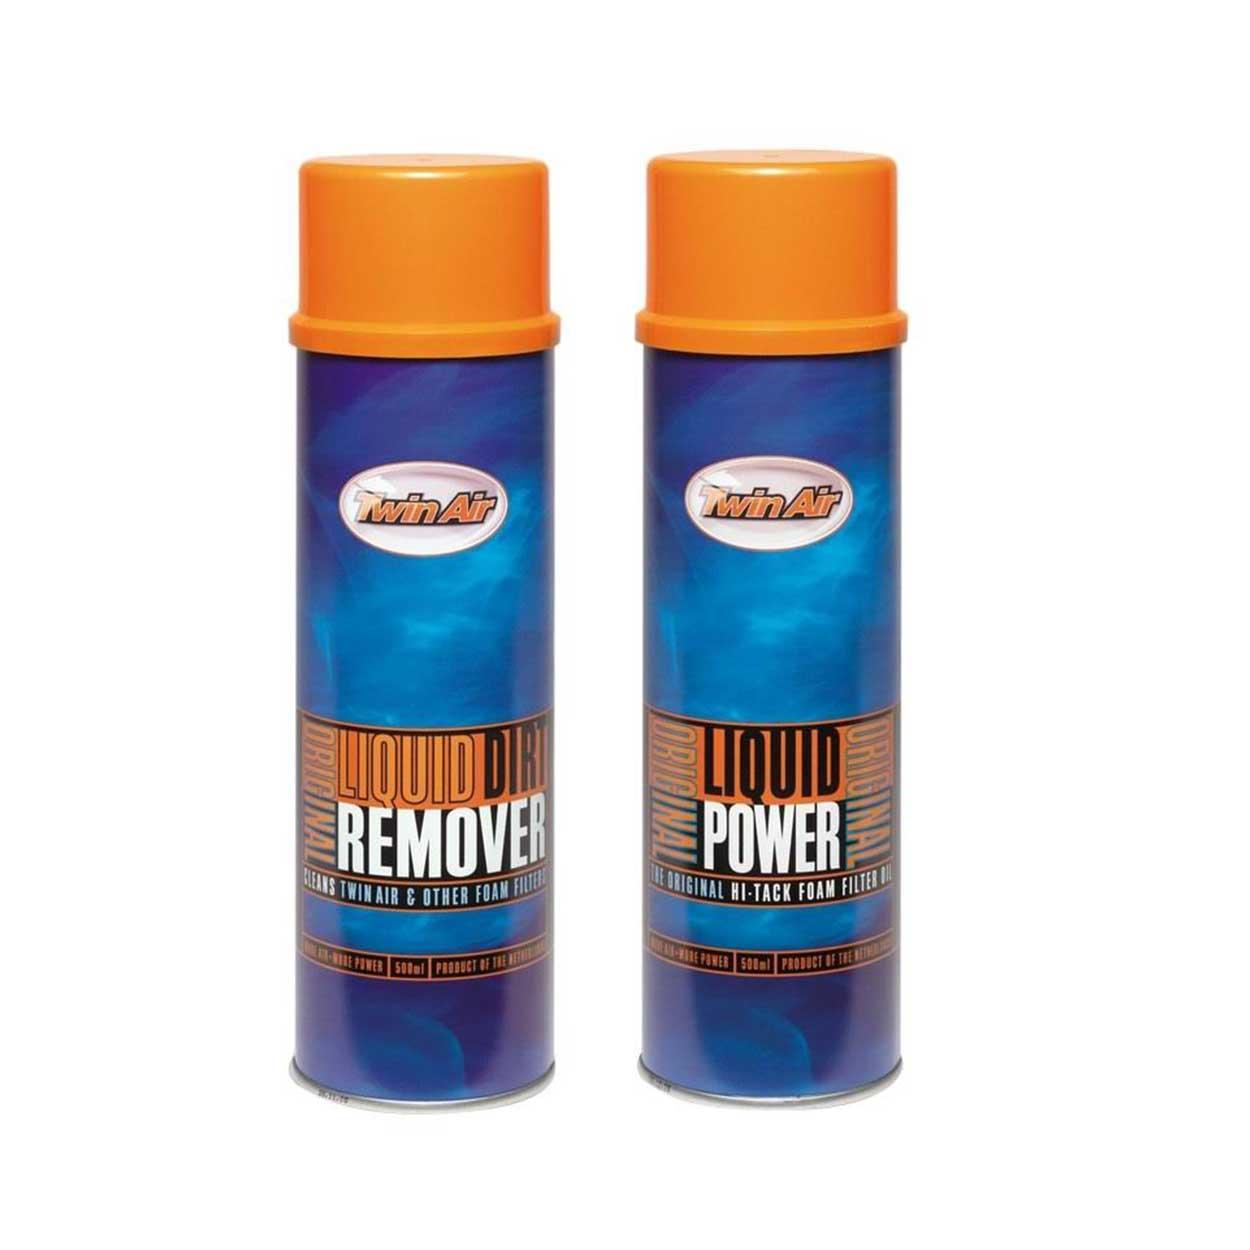 Twin Air Liquid Power spray (500ml) + Dirt Remover spray (500ml)